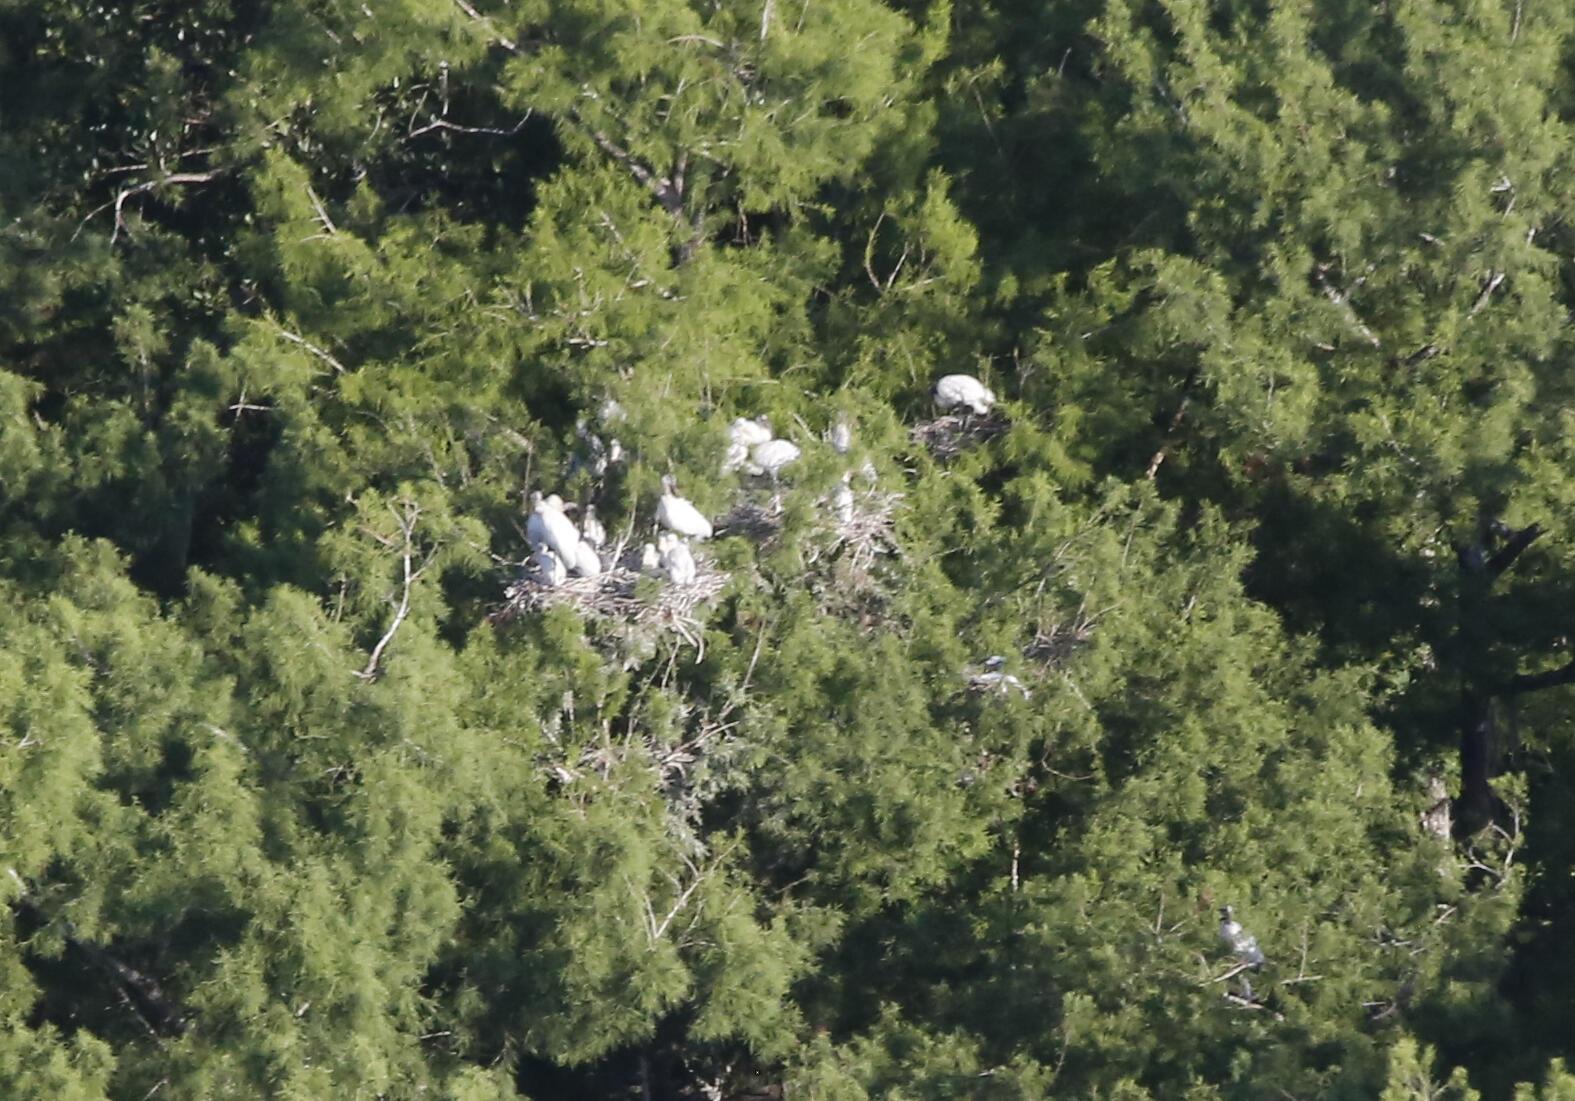 Wood stork nests